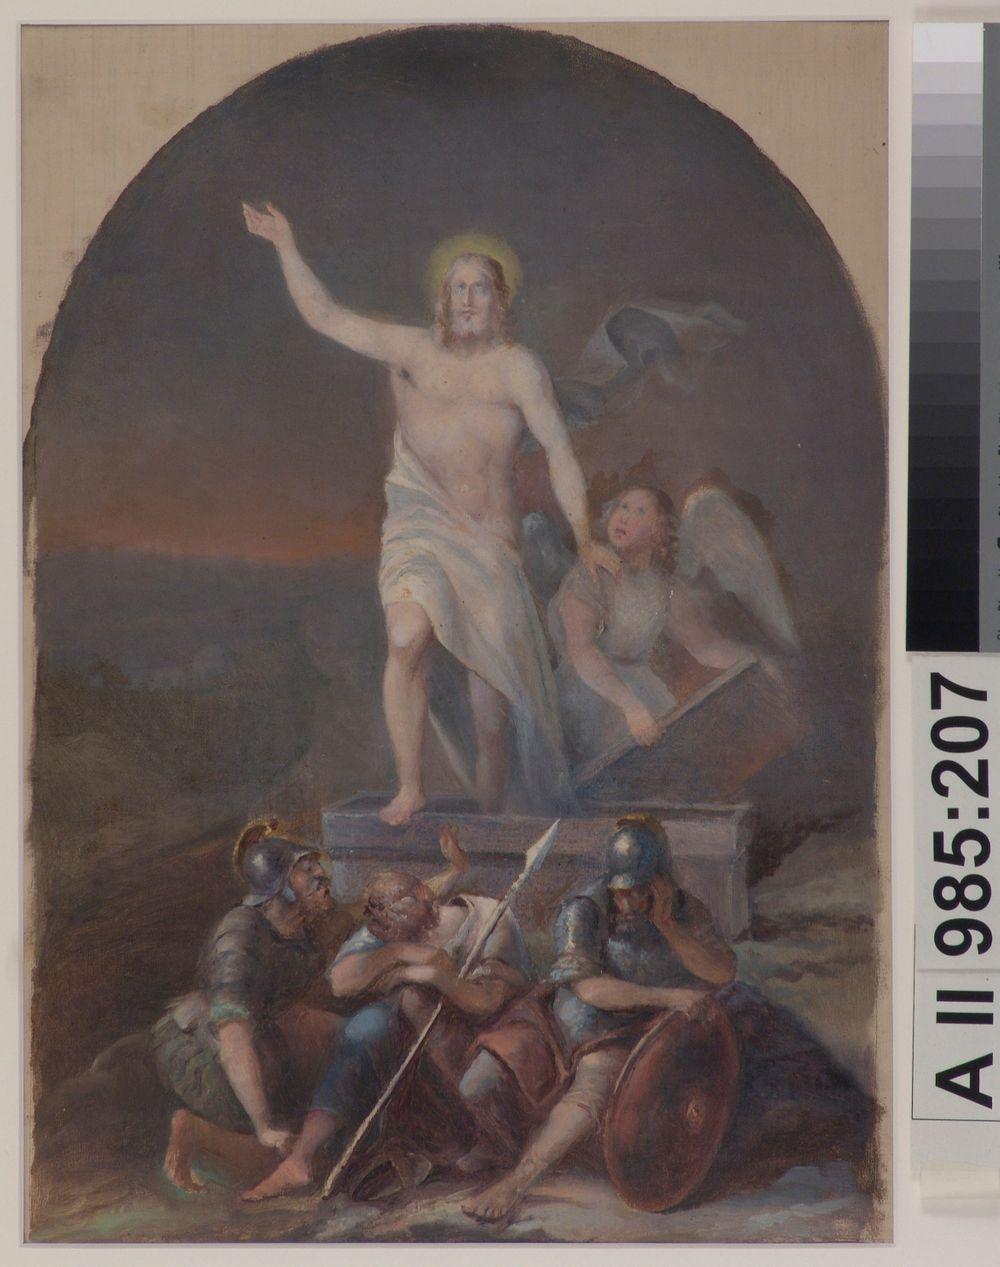 Kristuksen ylösnousemus, mahdollisesti Vihdin kirkon alttaritaulun luonnos ; Kristus uppståndelse, troligtvis skiss för altartavlan i Vihtis kyrka